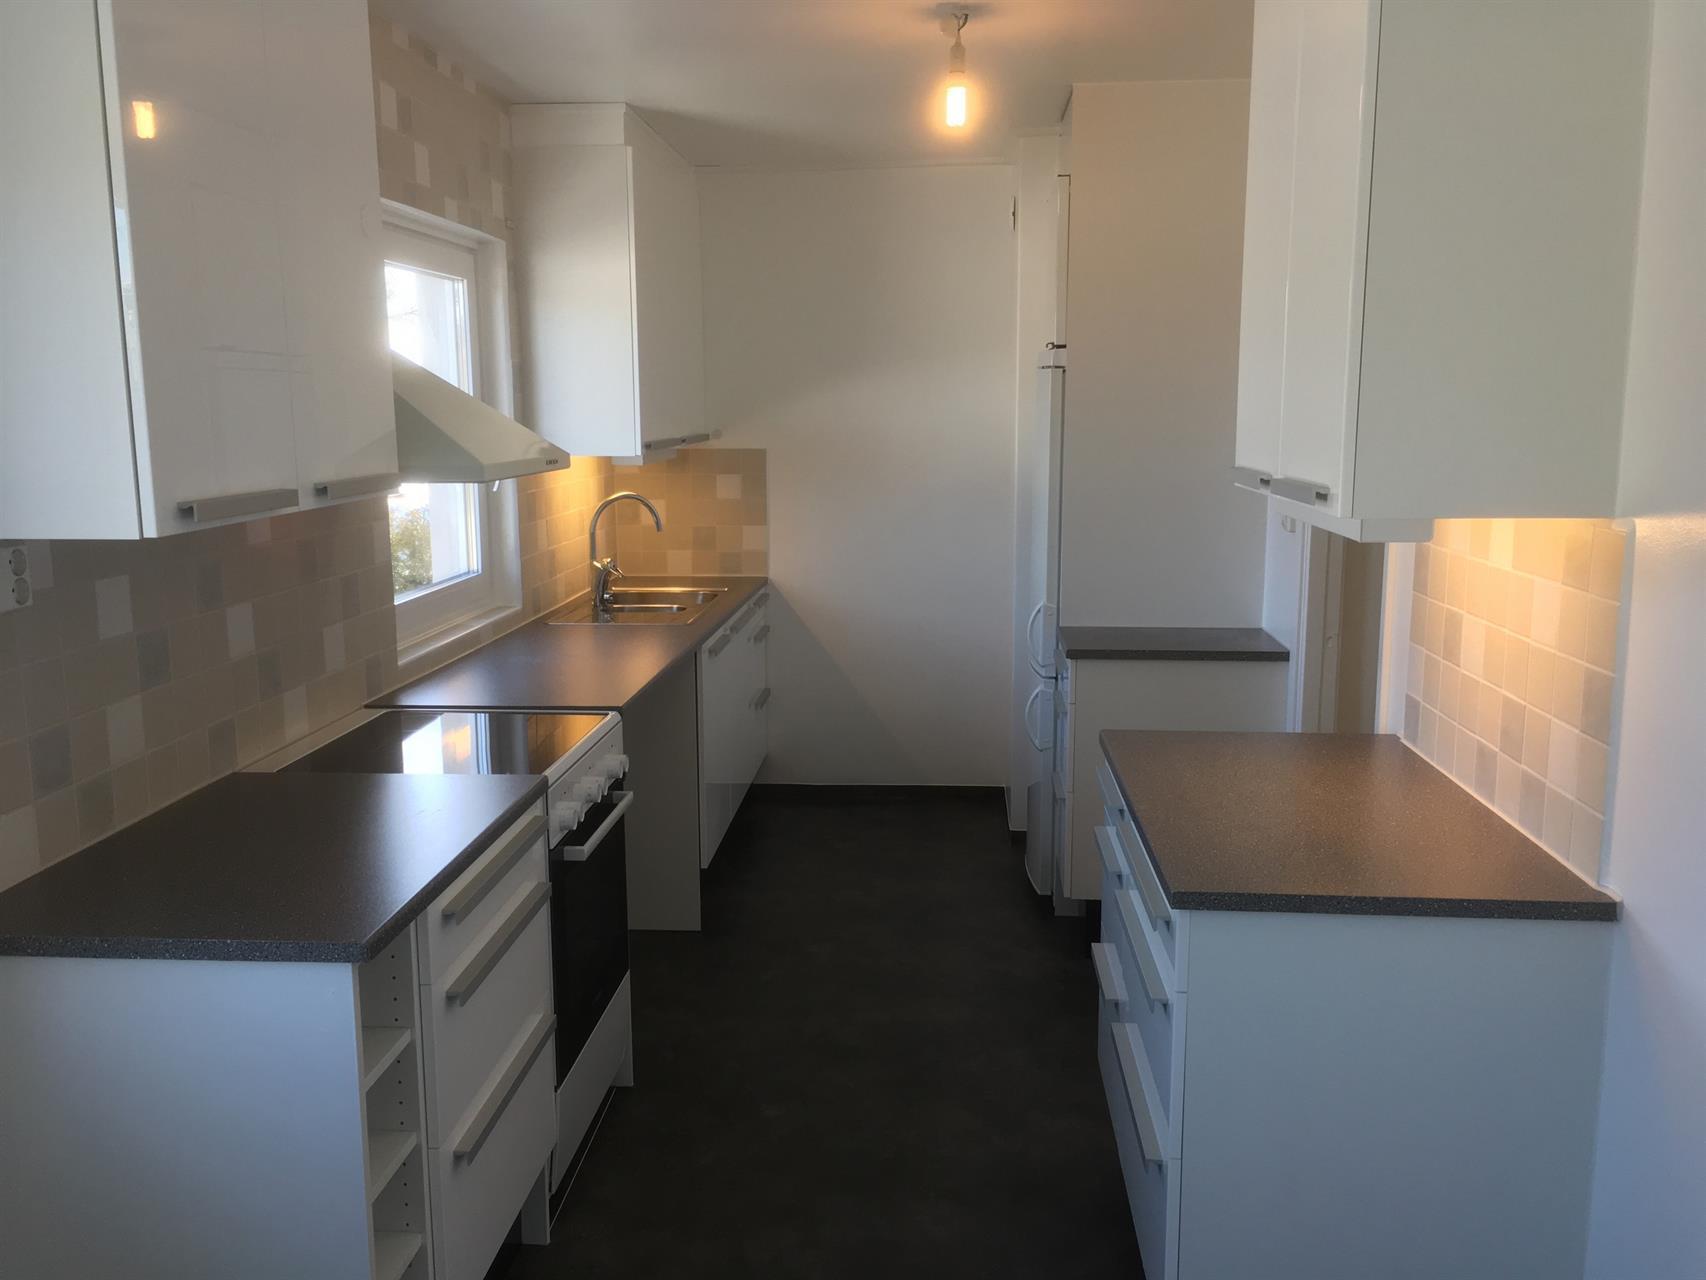 Köksrenovering golv-/kakel/måleriarbeten